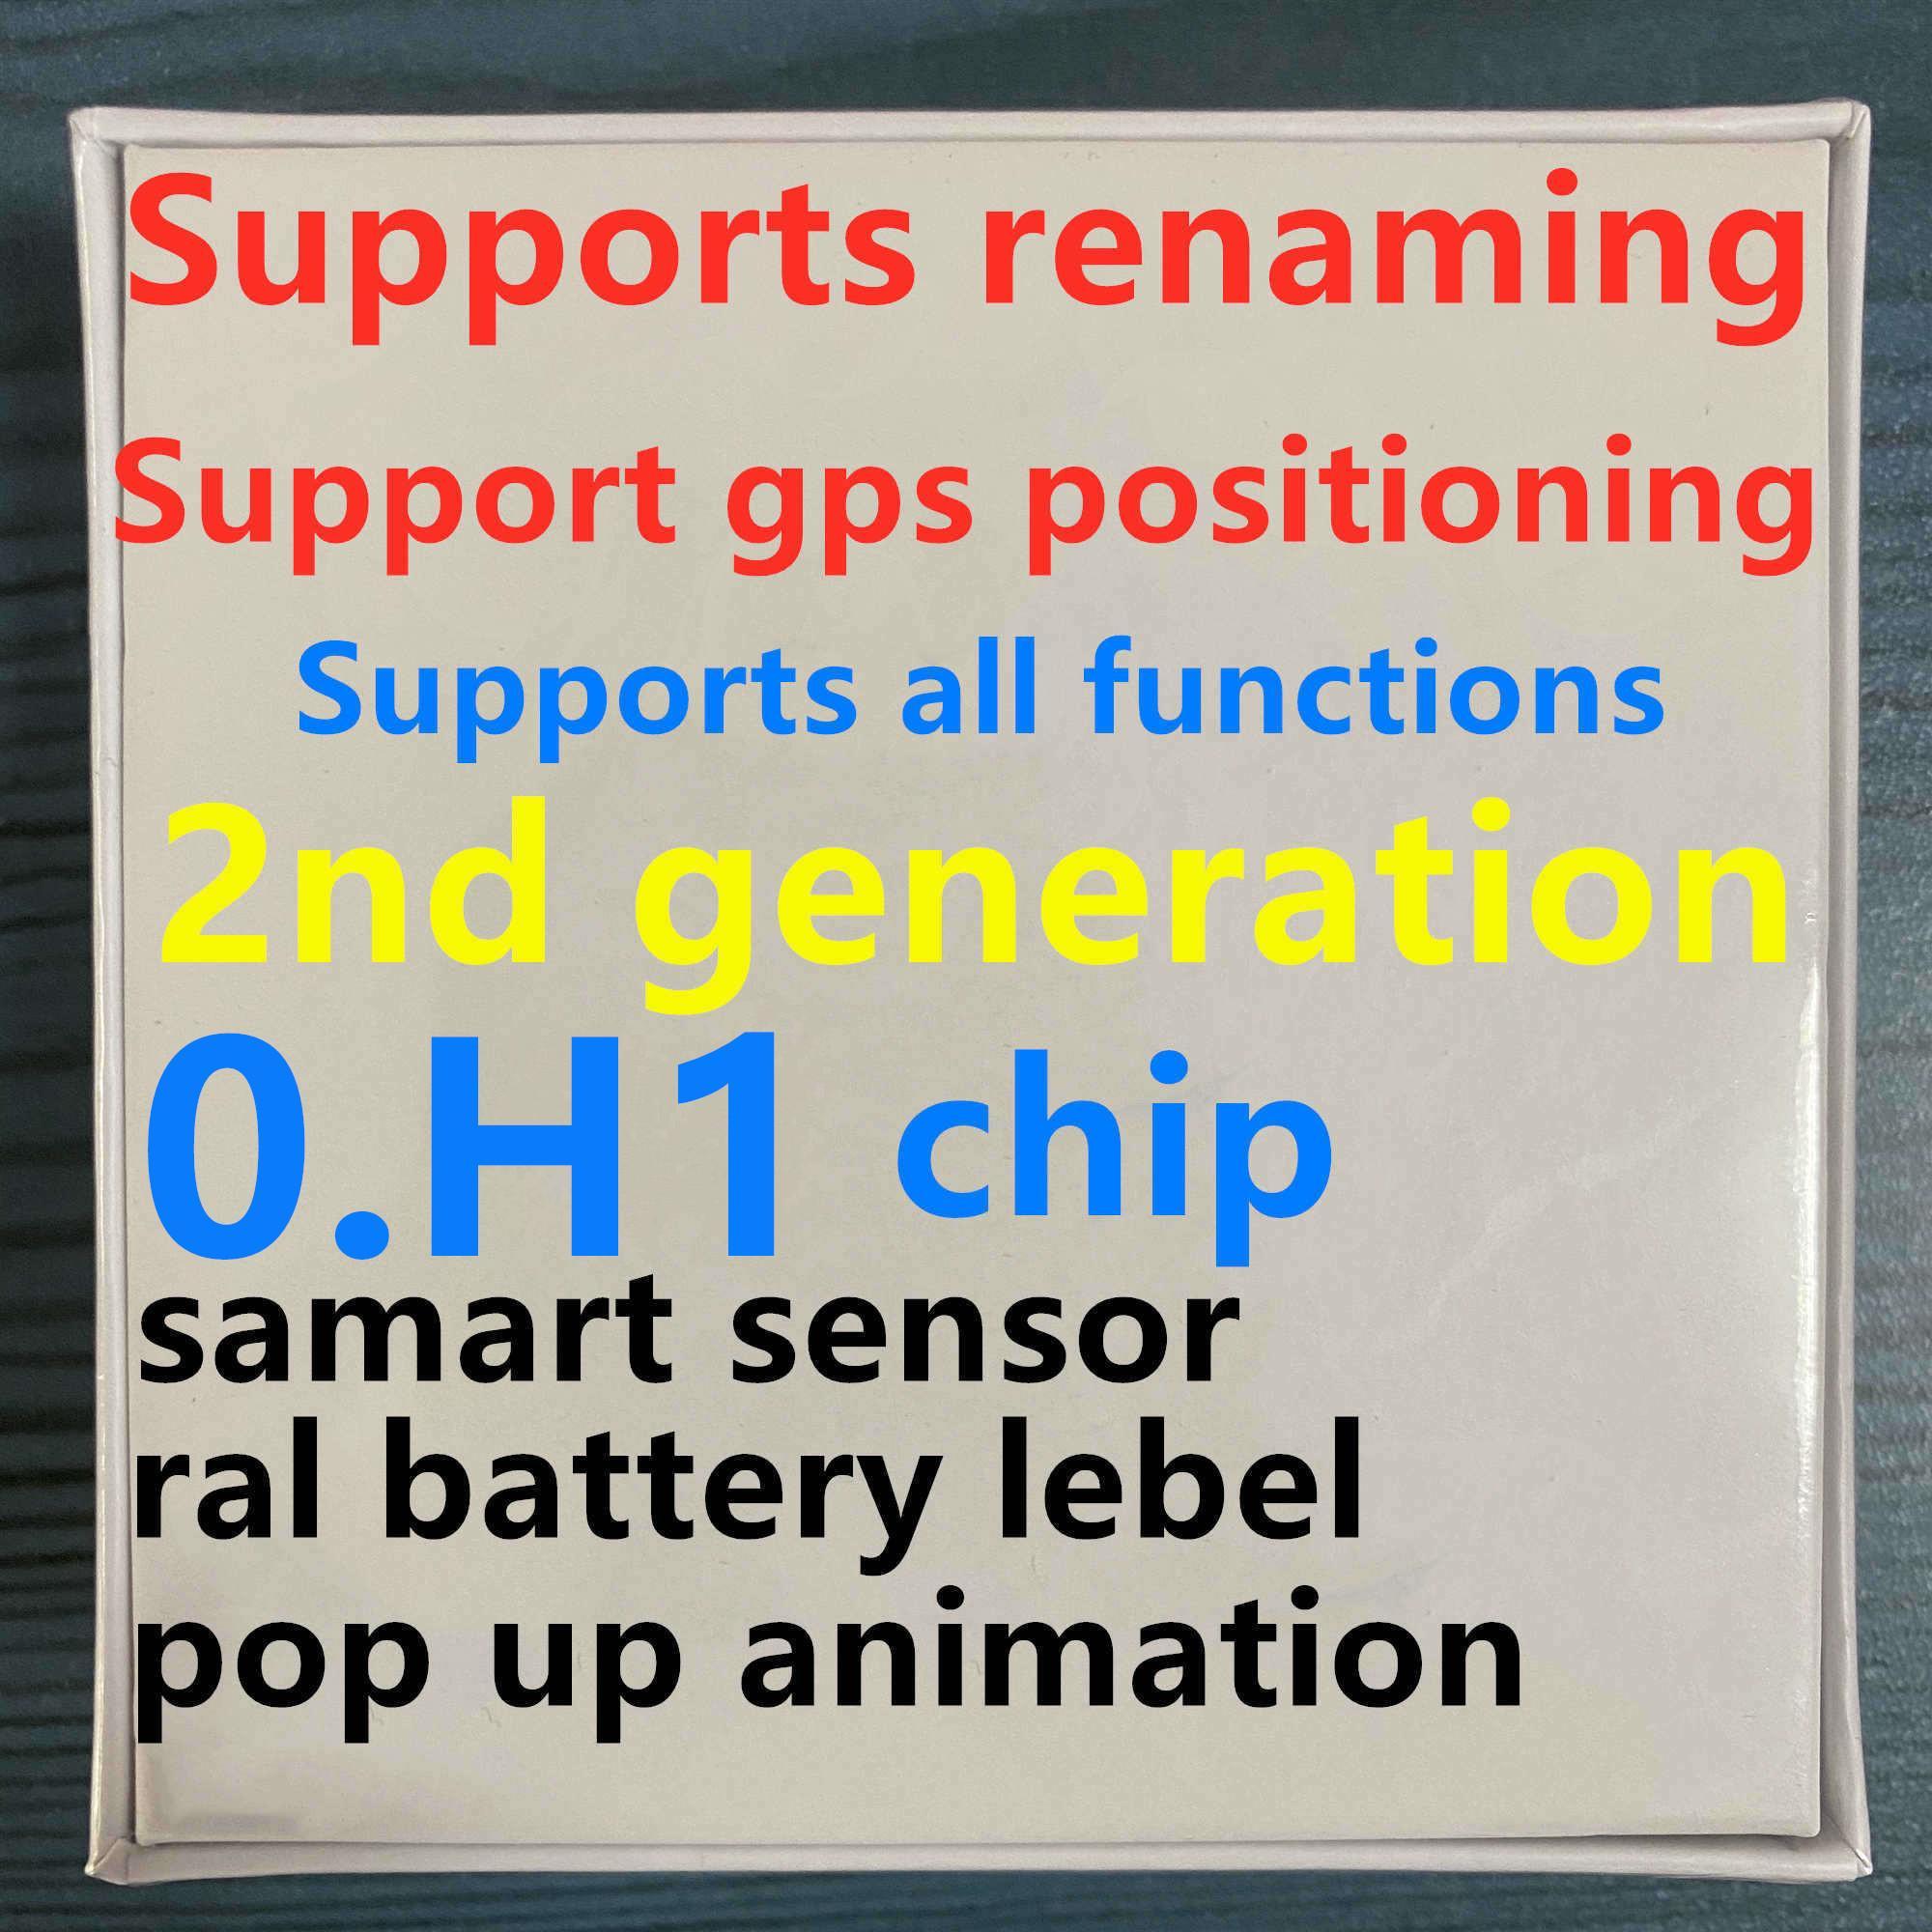 0 H1 이어폰 칩 GPS를 이름 바꾸기 에어 AP3 2 개 포드가의 경우 이어폰을 충전 창 블루투스 헤드폰 자동 페어링의 wireles 팝업 AP2 TWS 세대 프로